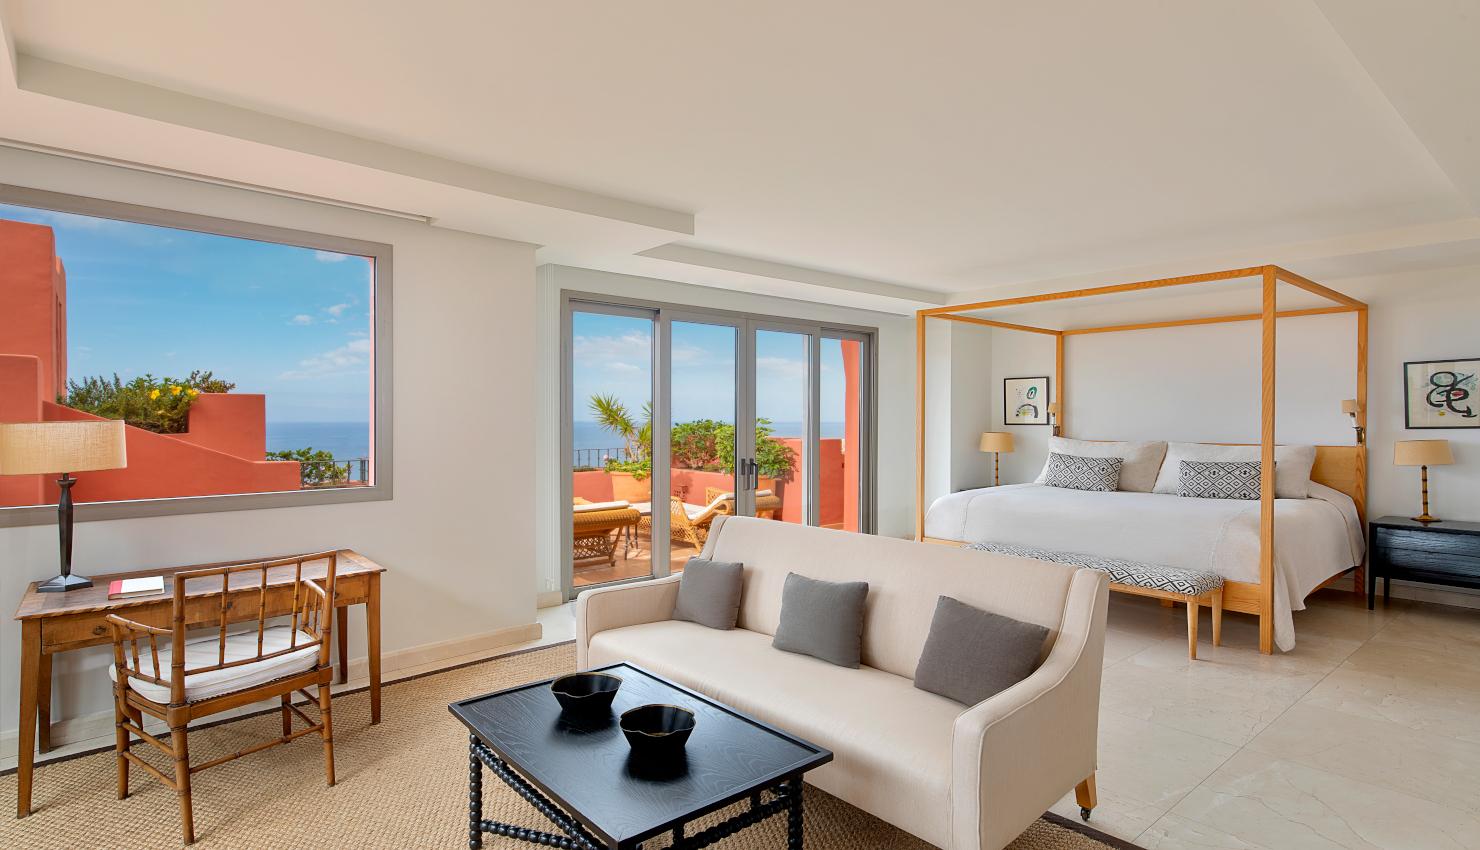 The Ritz-Carlton Suite-magazinehorse